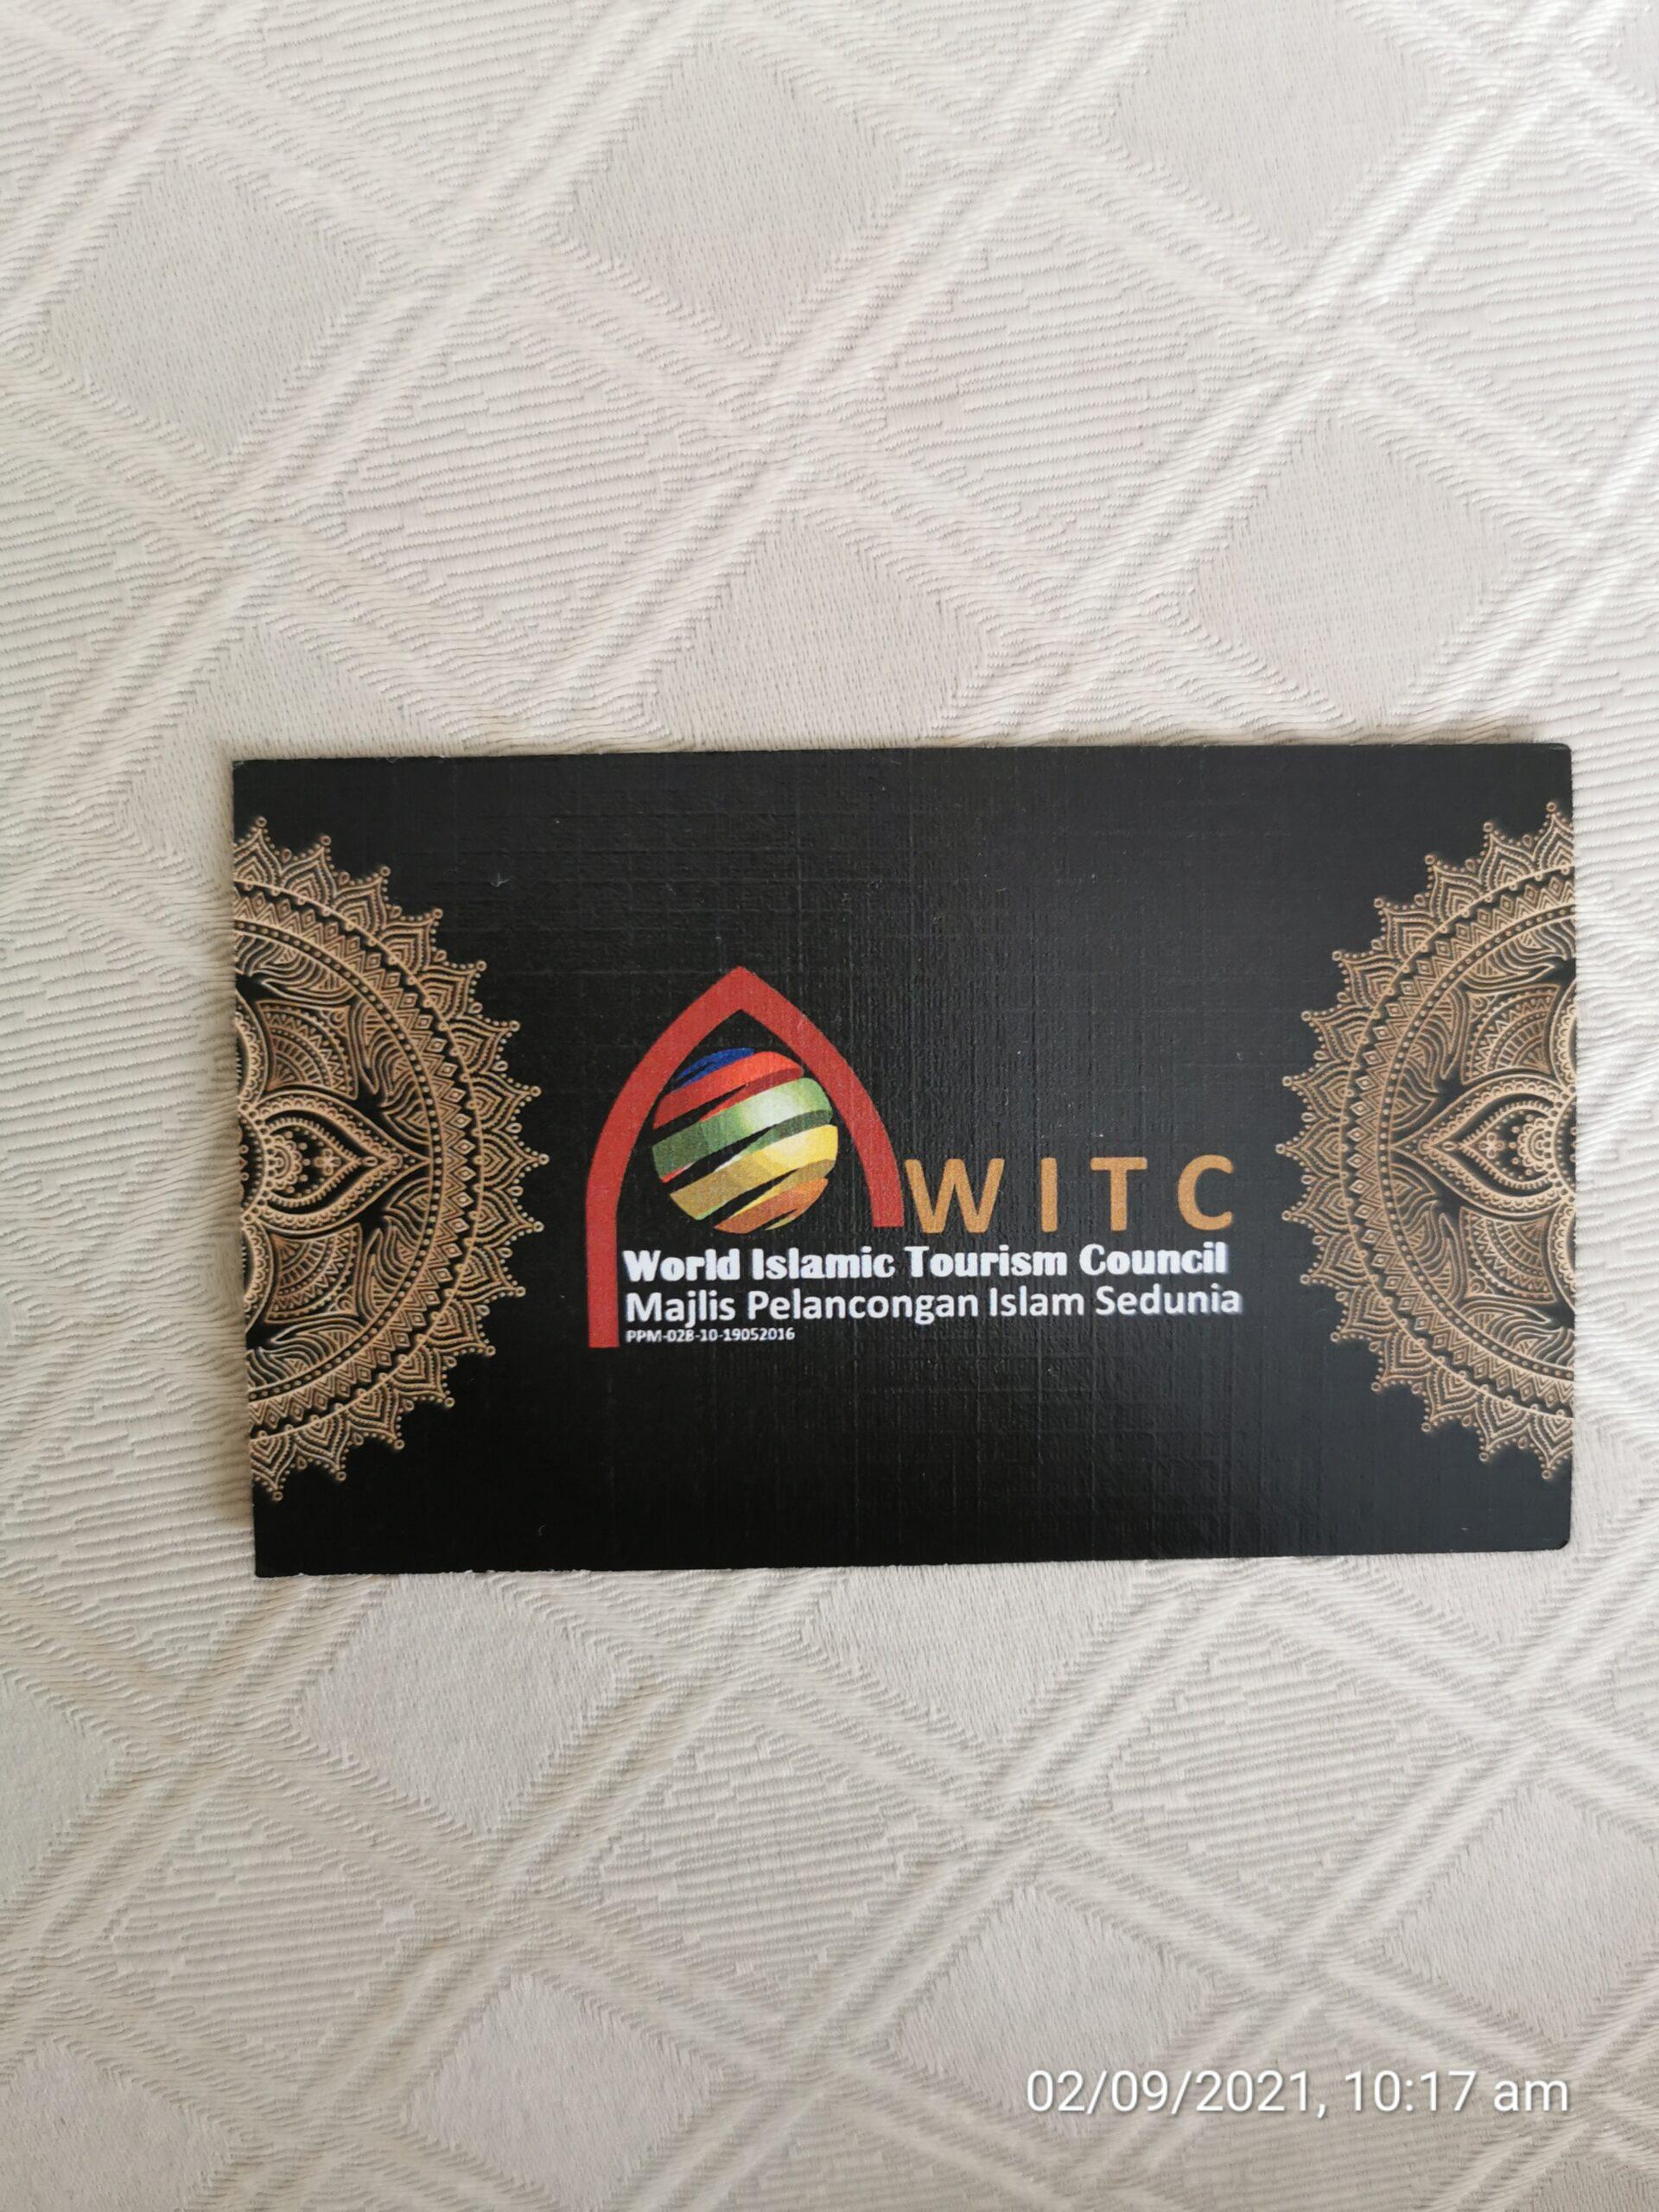 World Islamic Tourism Council, Mohd Khalid Harun, Negeri Sembilan, Malaysia